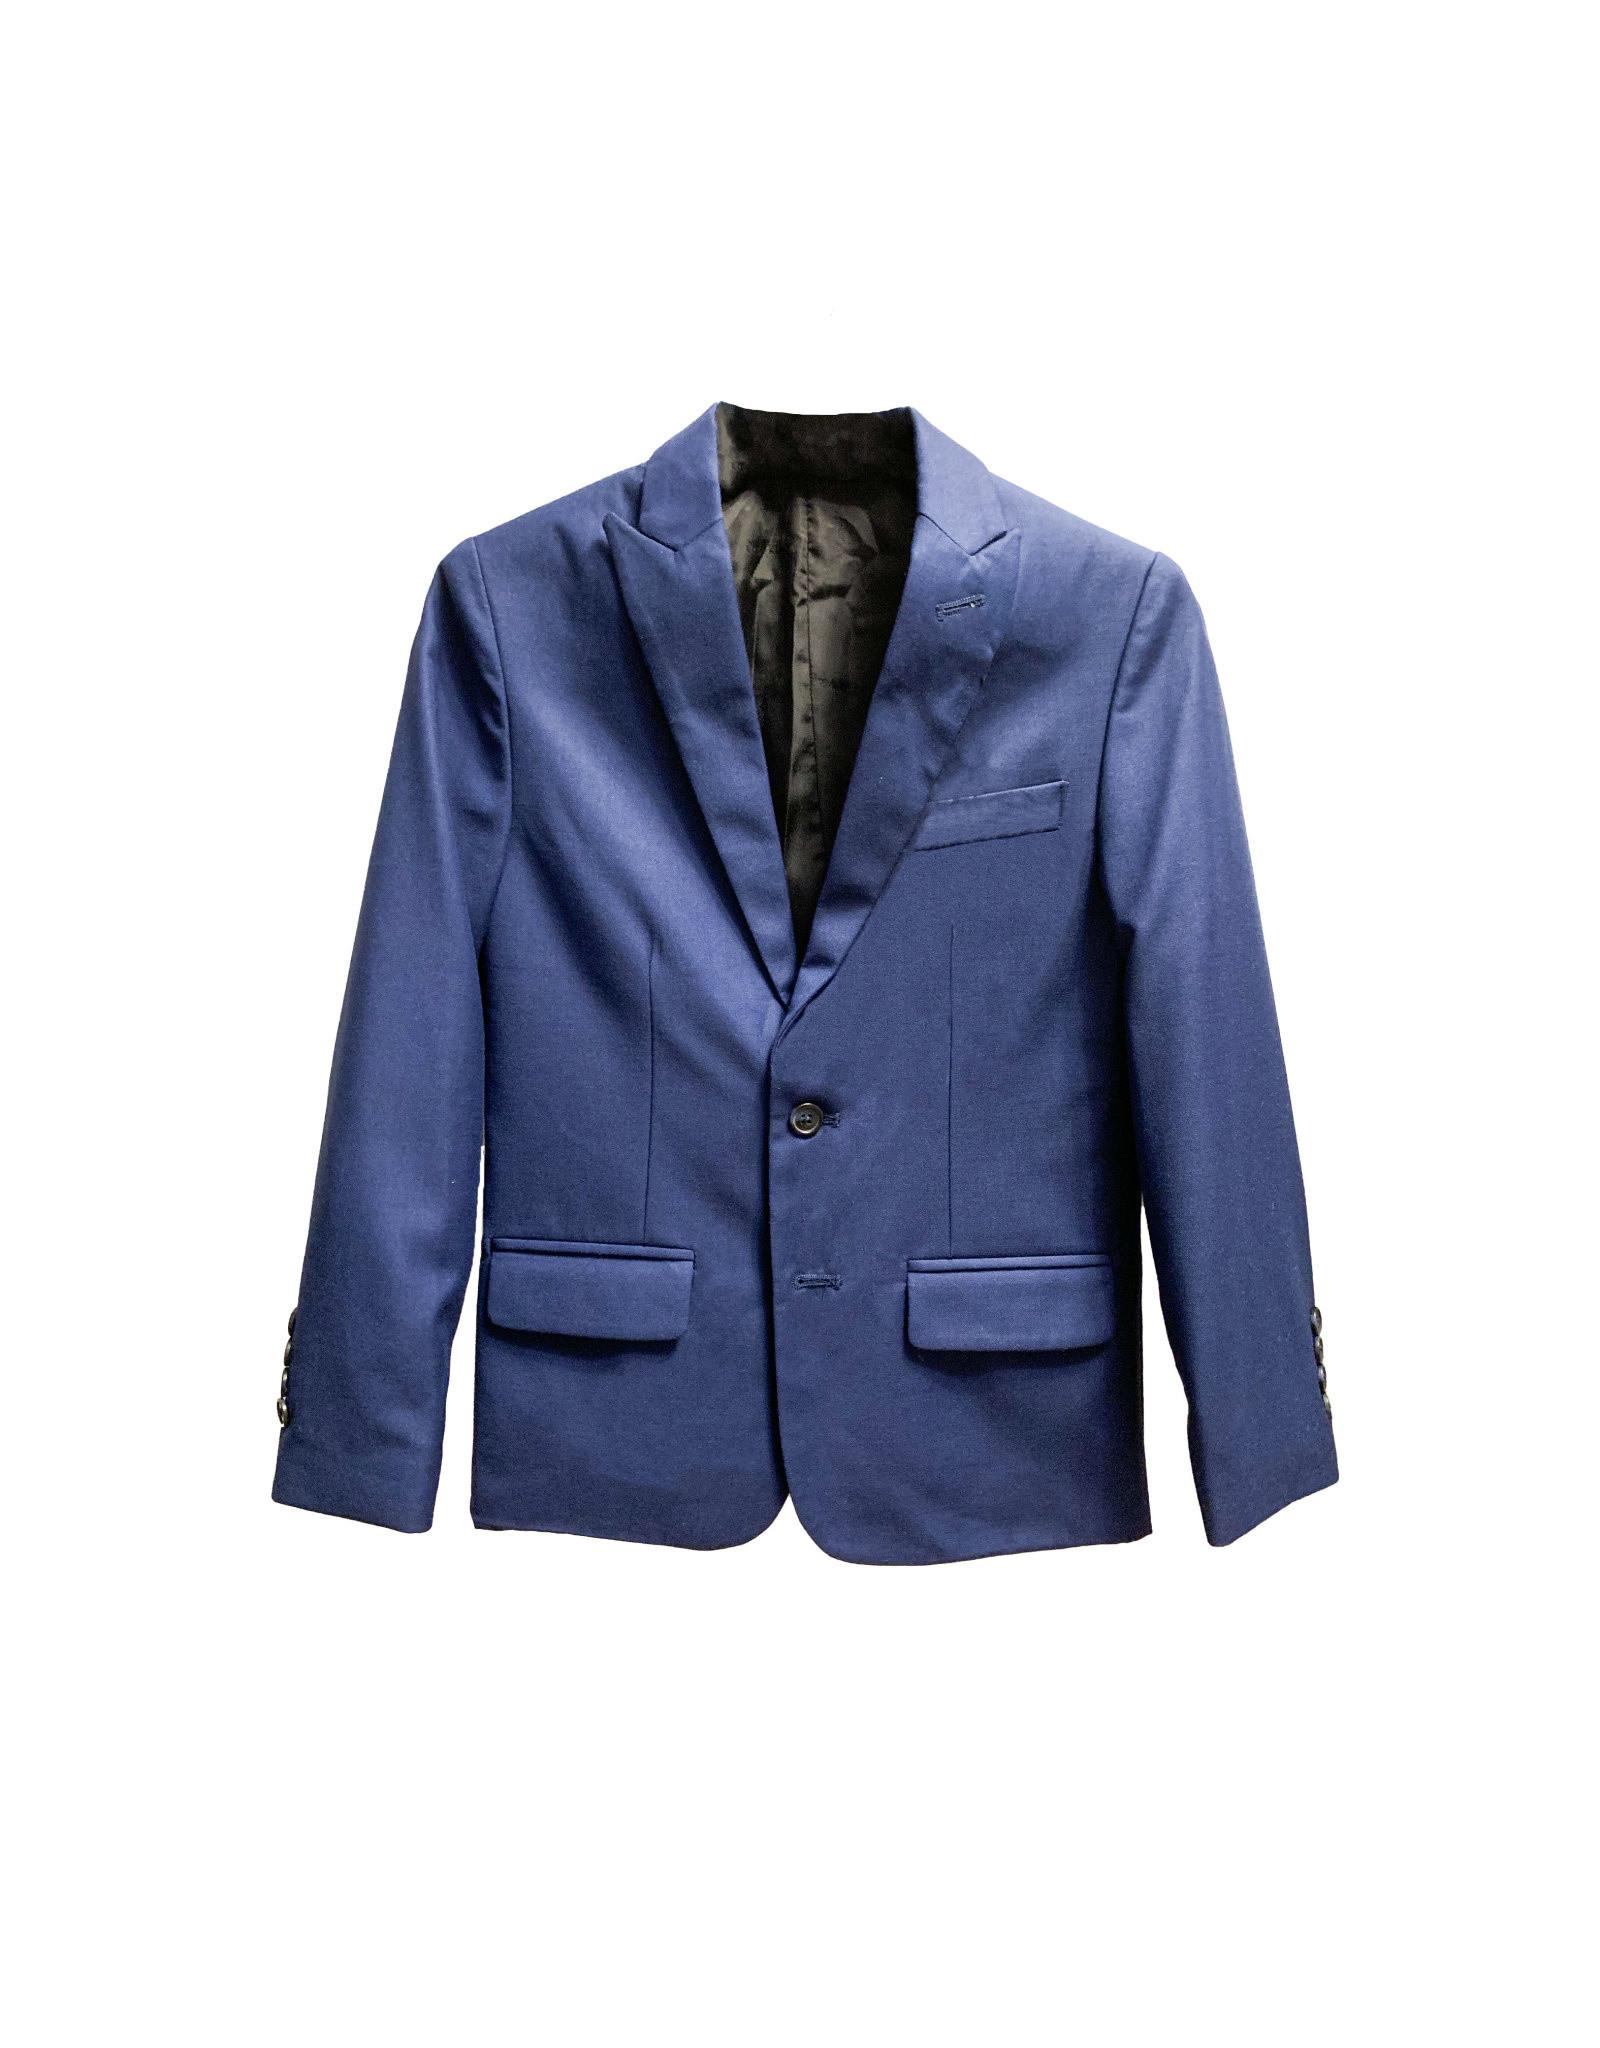 Calvin Klein Calvin Klein  Boy's Classic Blazer Size: 10